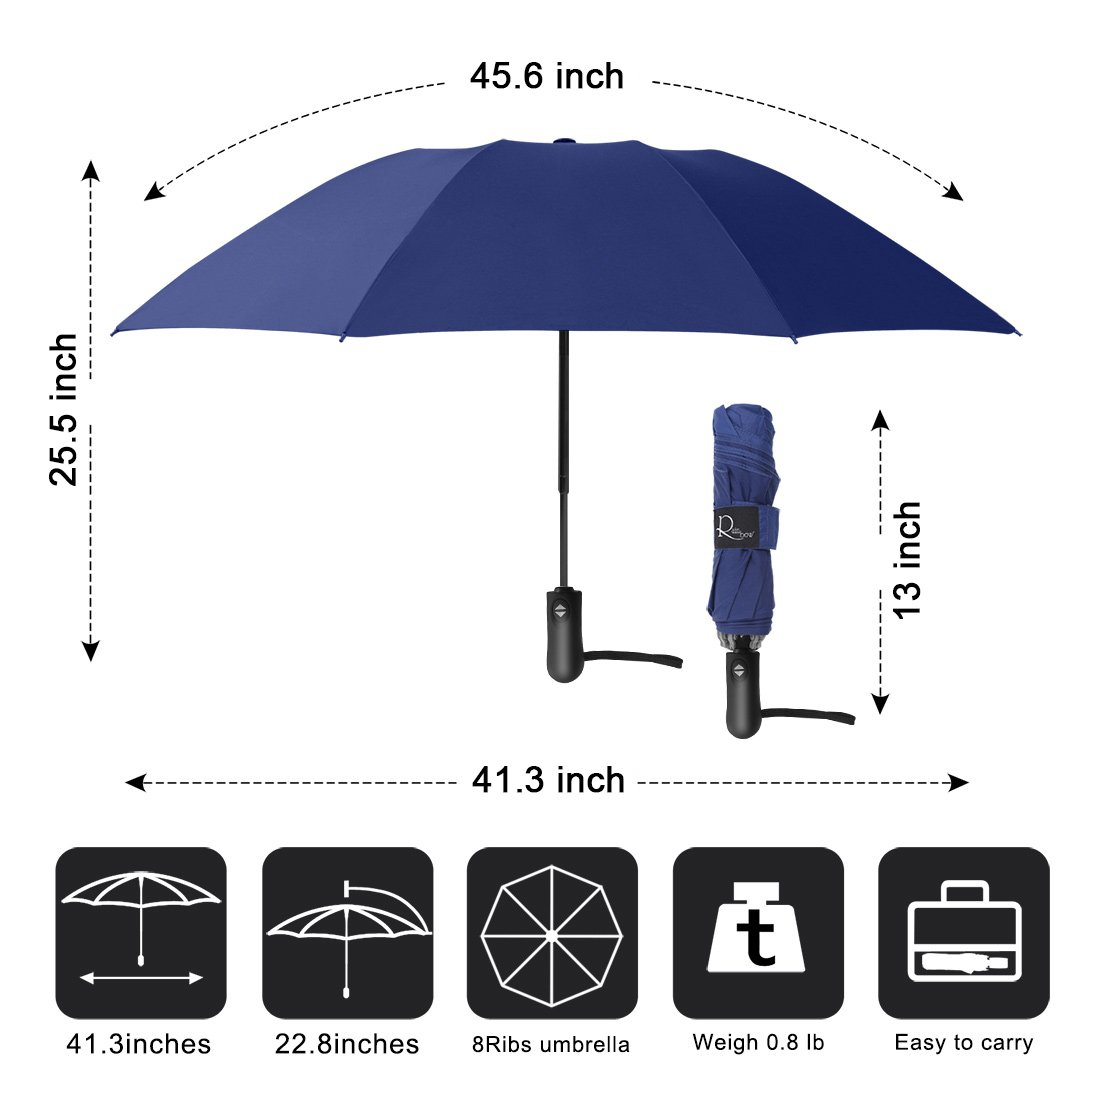 Nesus Umbrella Windproof Travel Umbrella 8 Ribs Auto Open Close with Waterproof Canopy Compact Folding Reverse Umbrella(Blue) by Nesus (Image #4)